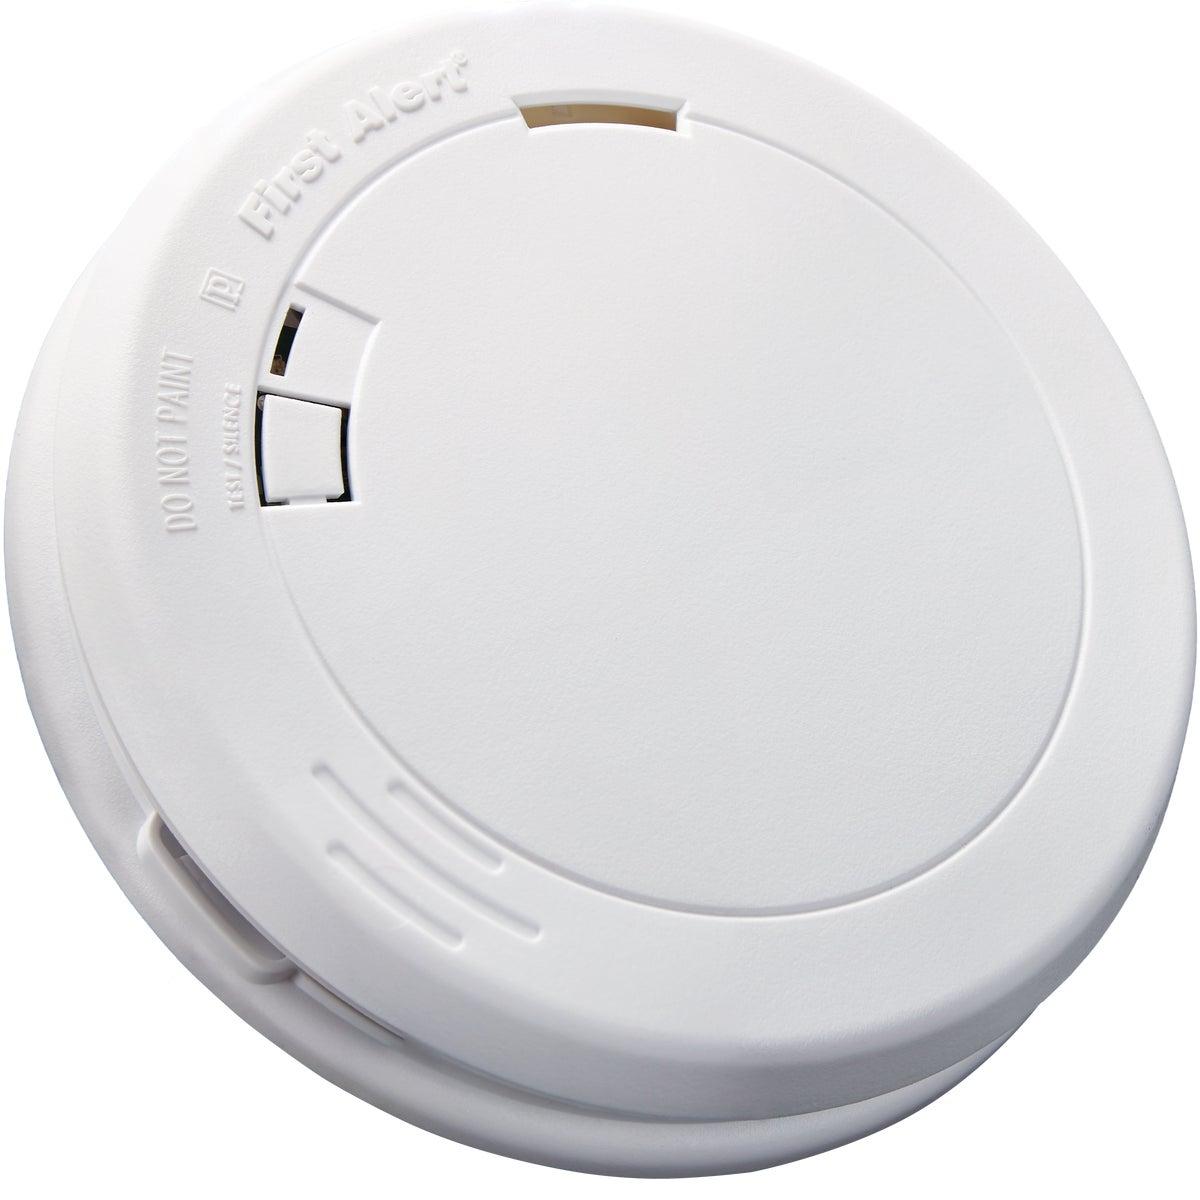 10 Yr Smoke Alarm